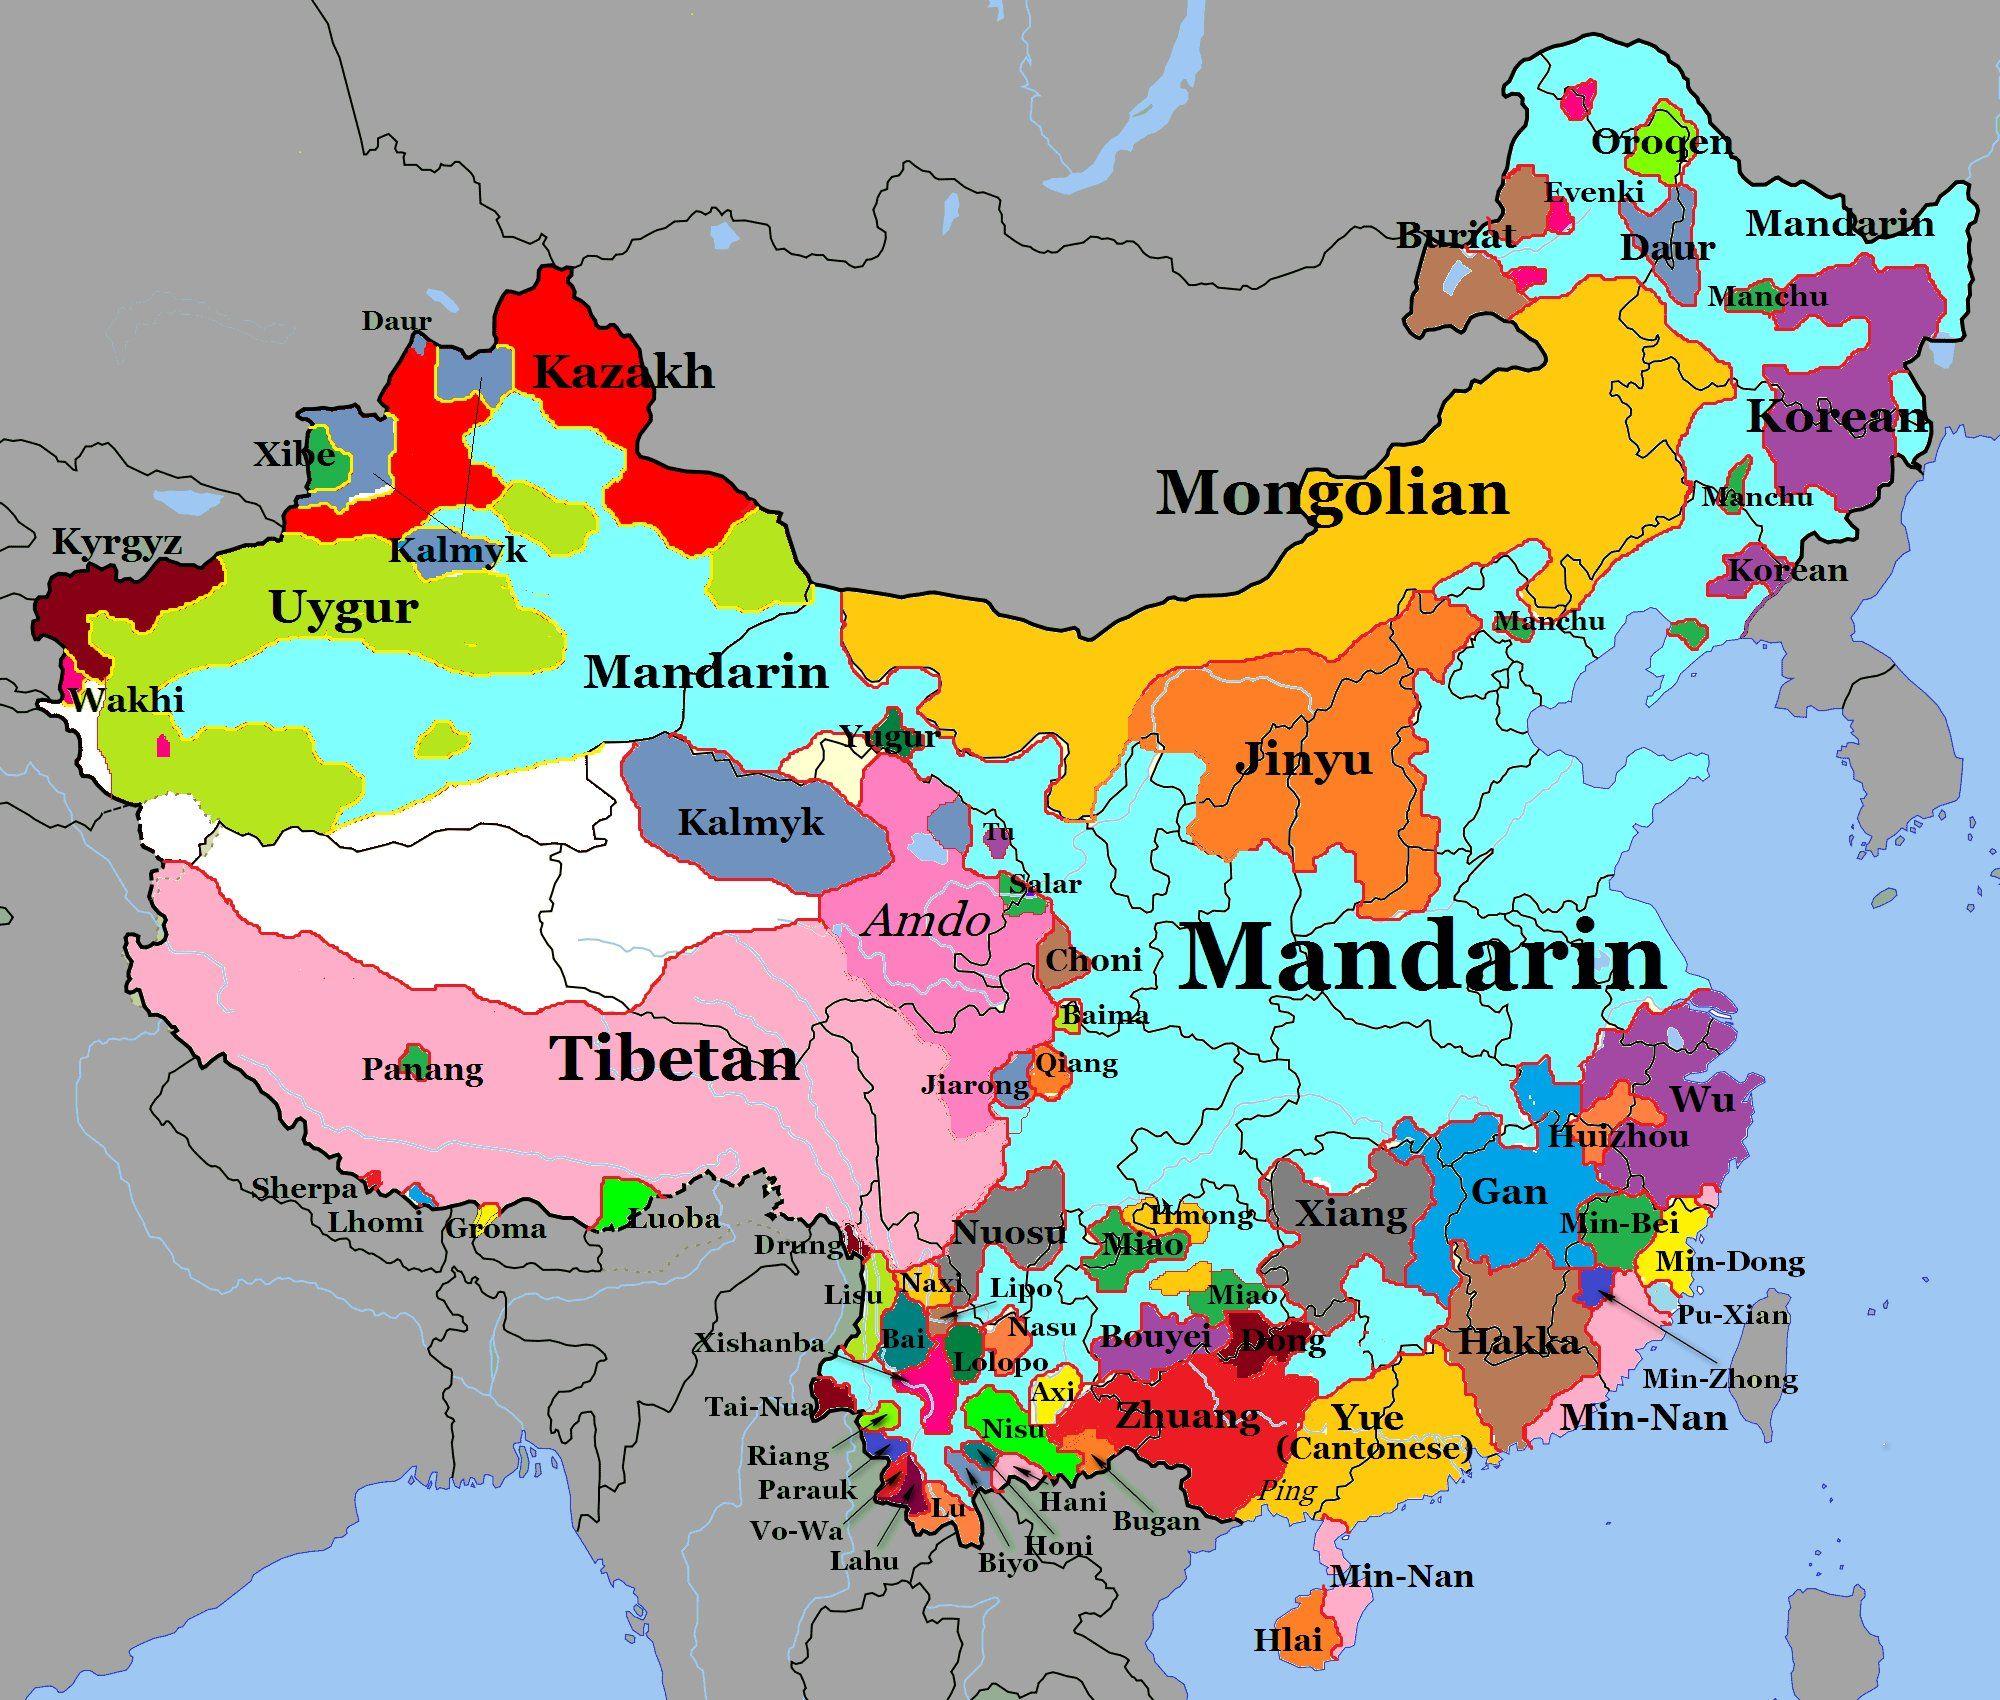 languages of china map - Google zoeken